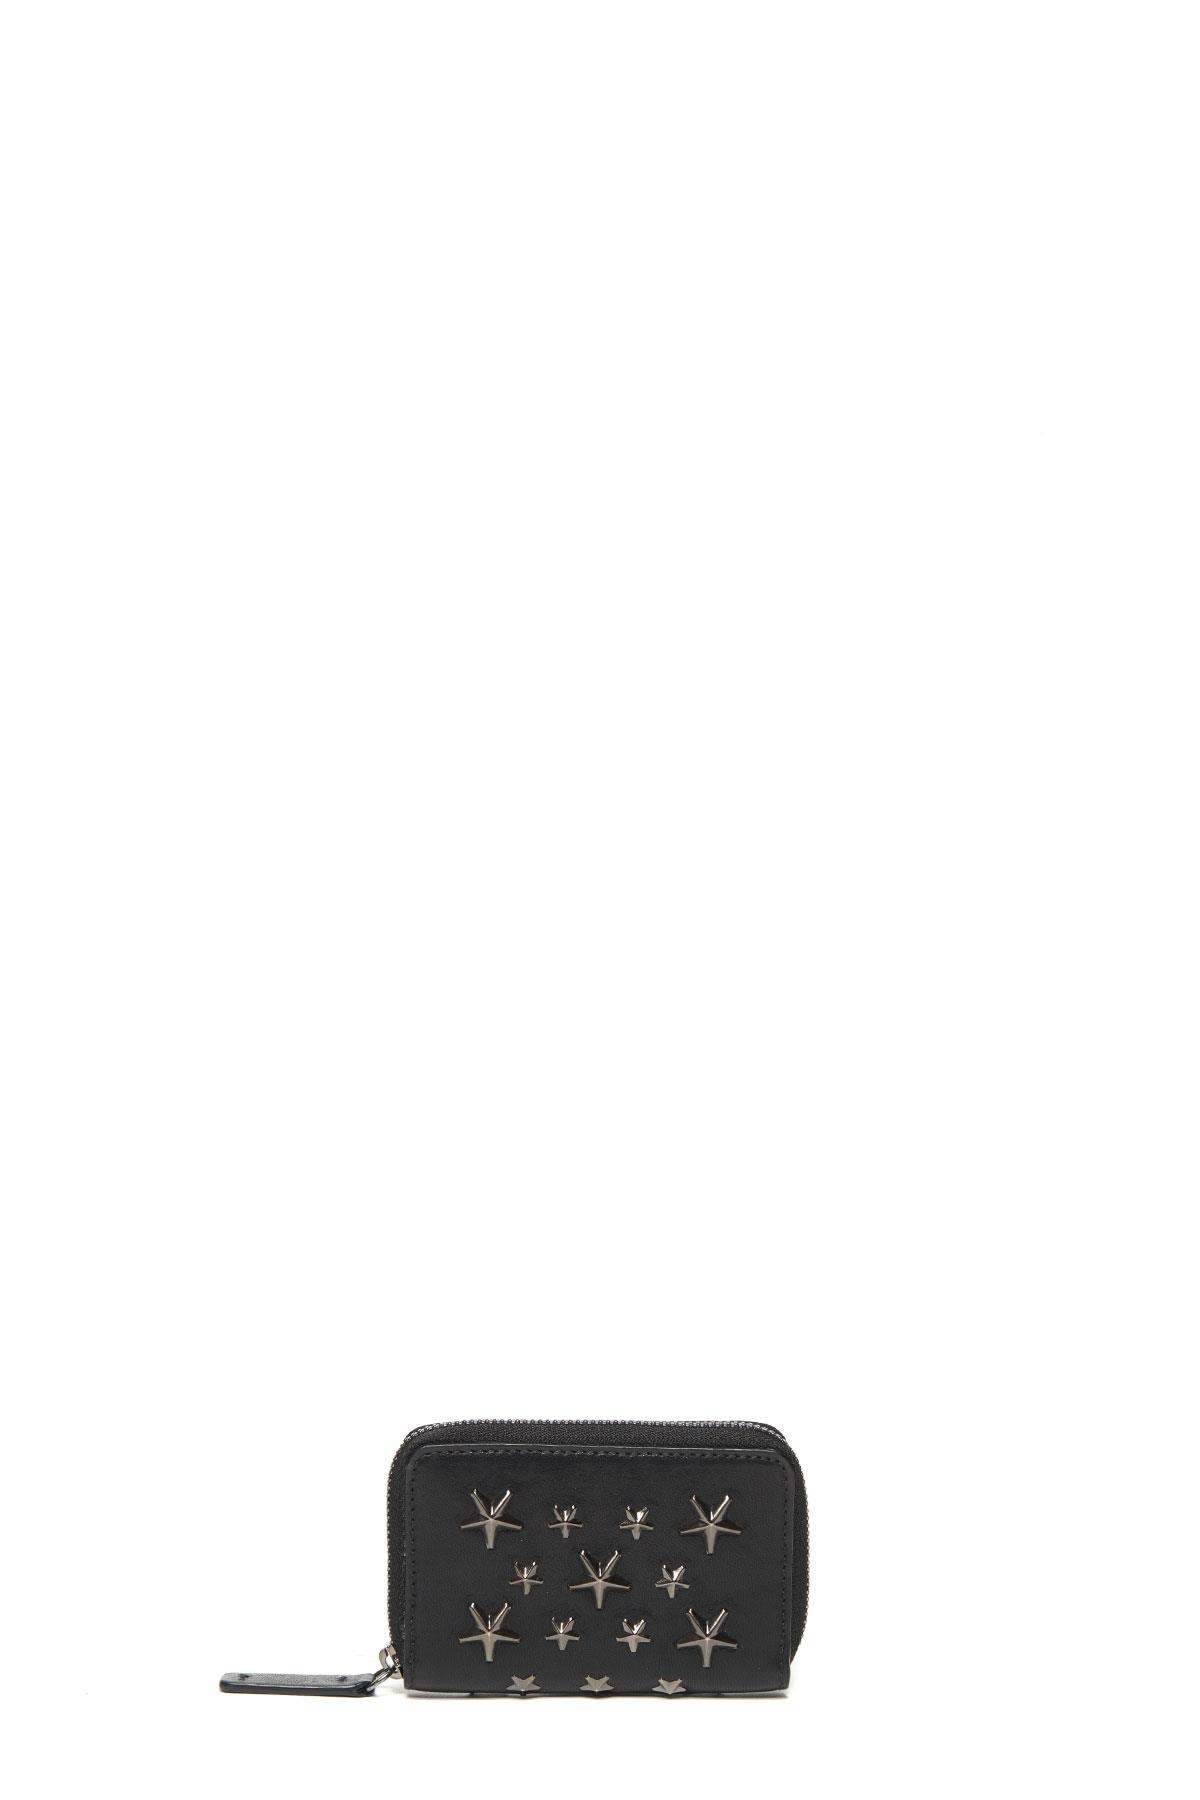 1e88cb754b12 jimmy choo Zipped wallet available on julian-fashion.com - 38182